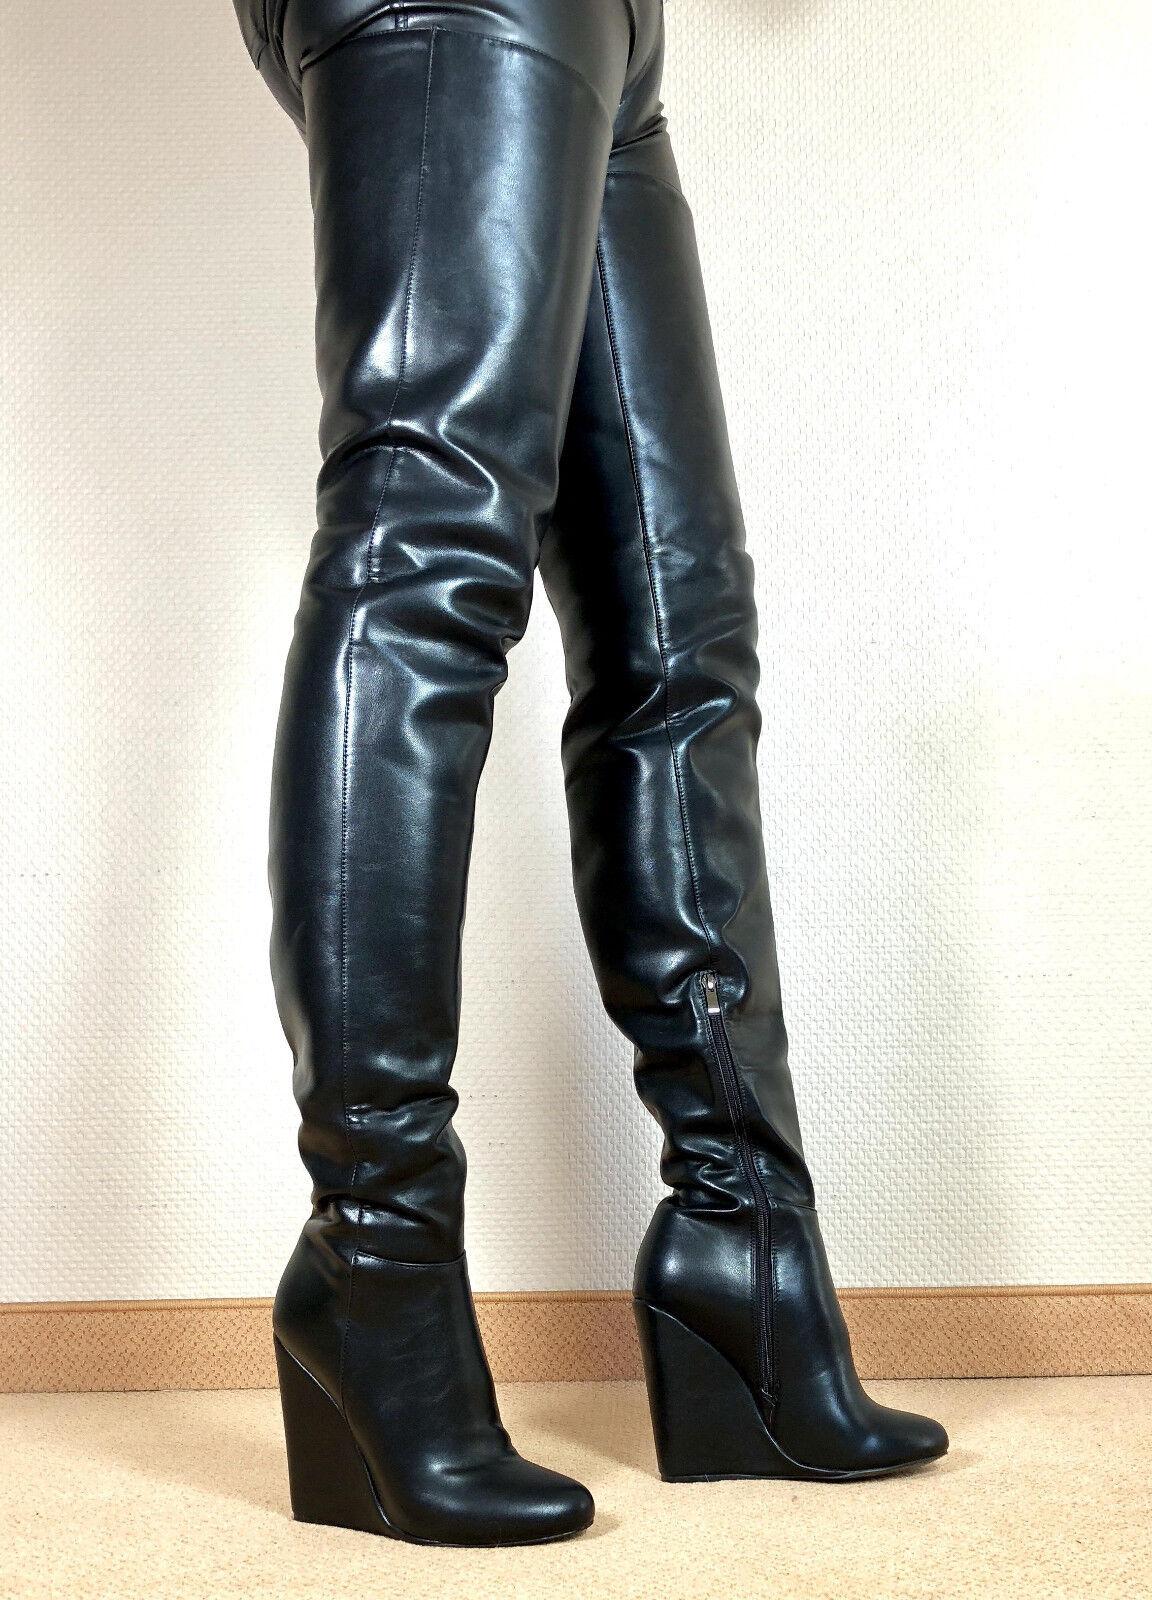 Grandes zapatos con descuento Gr.46 TOP ! Exklusiv Sexy Damen Schuhe Overknee Wedges Stiefel Männer Boots E8